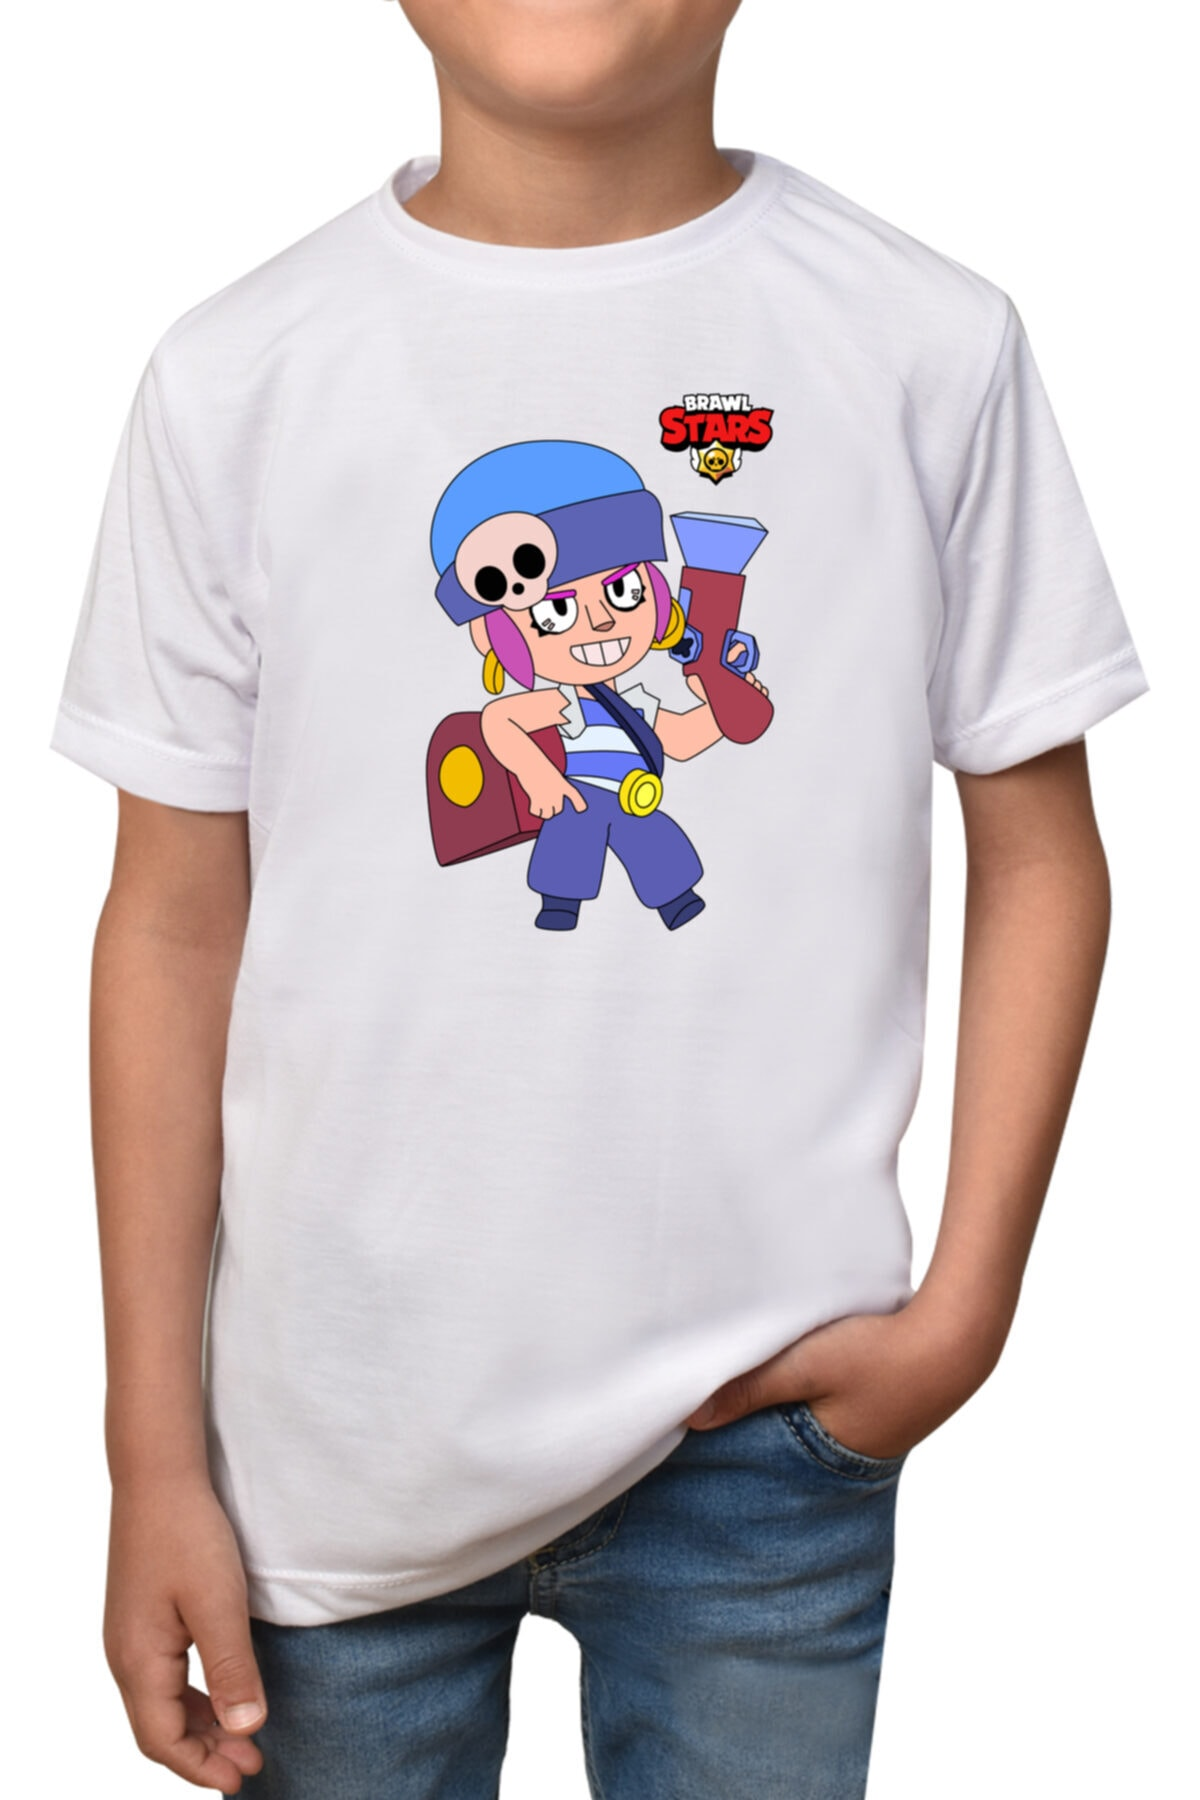 Unisex Çocuk Beyaz Brawl Stars - Penny-t-1 T-shirt T-2